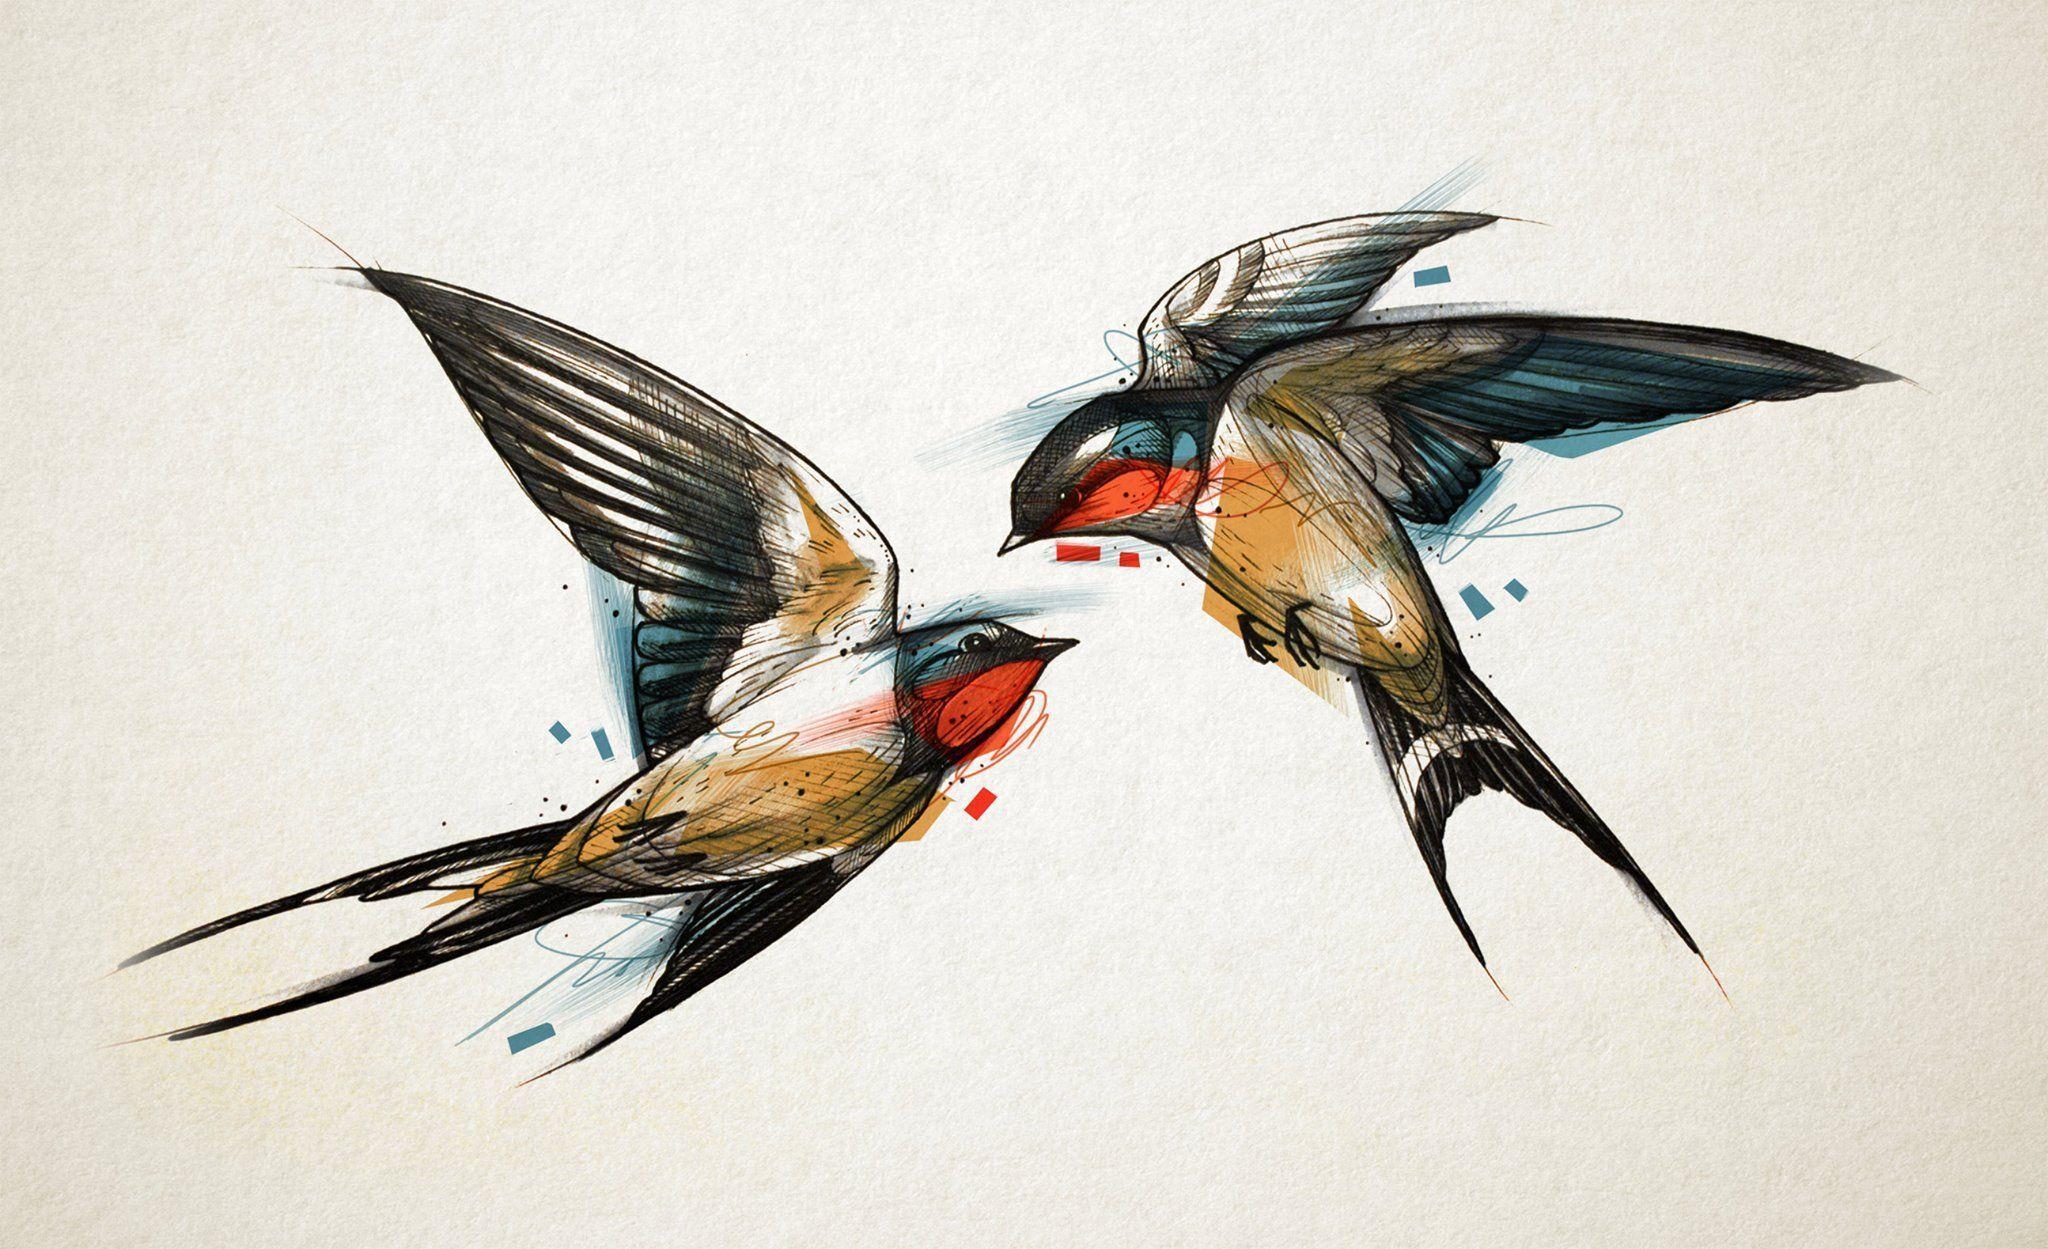 Tatouagesminimes Tatouagesdejambes In 2020 Bird Art Art Inspiration Birds Tattoo